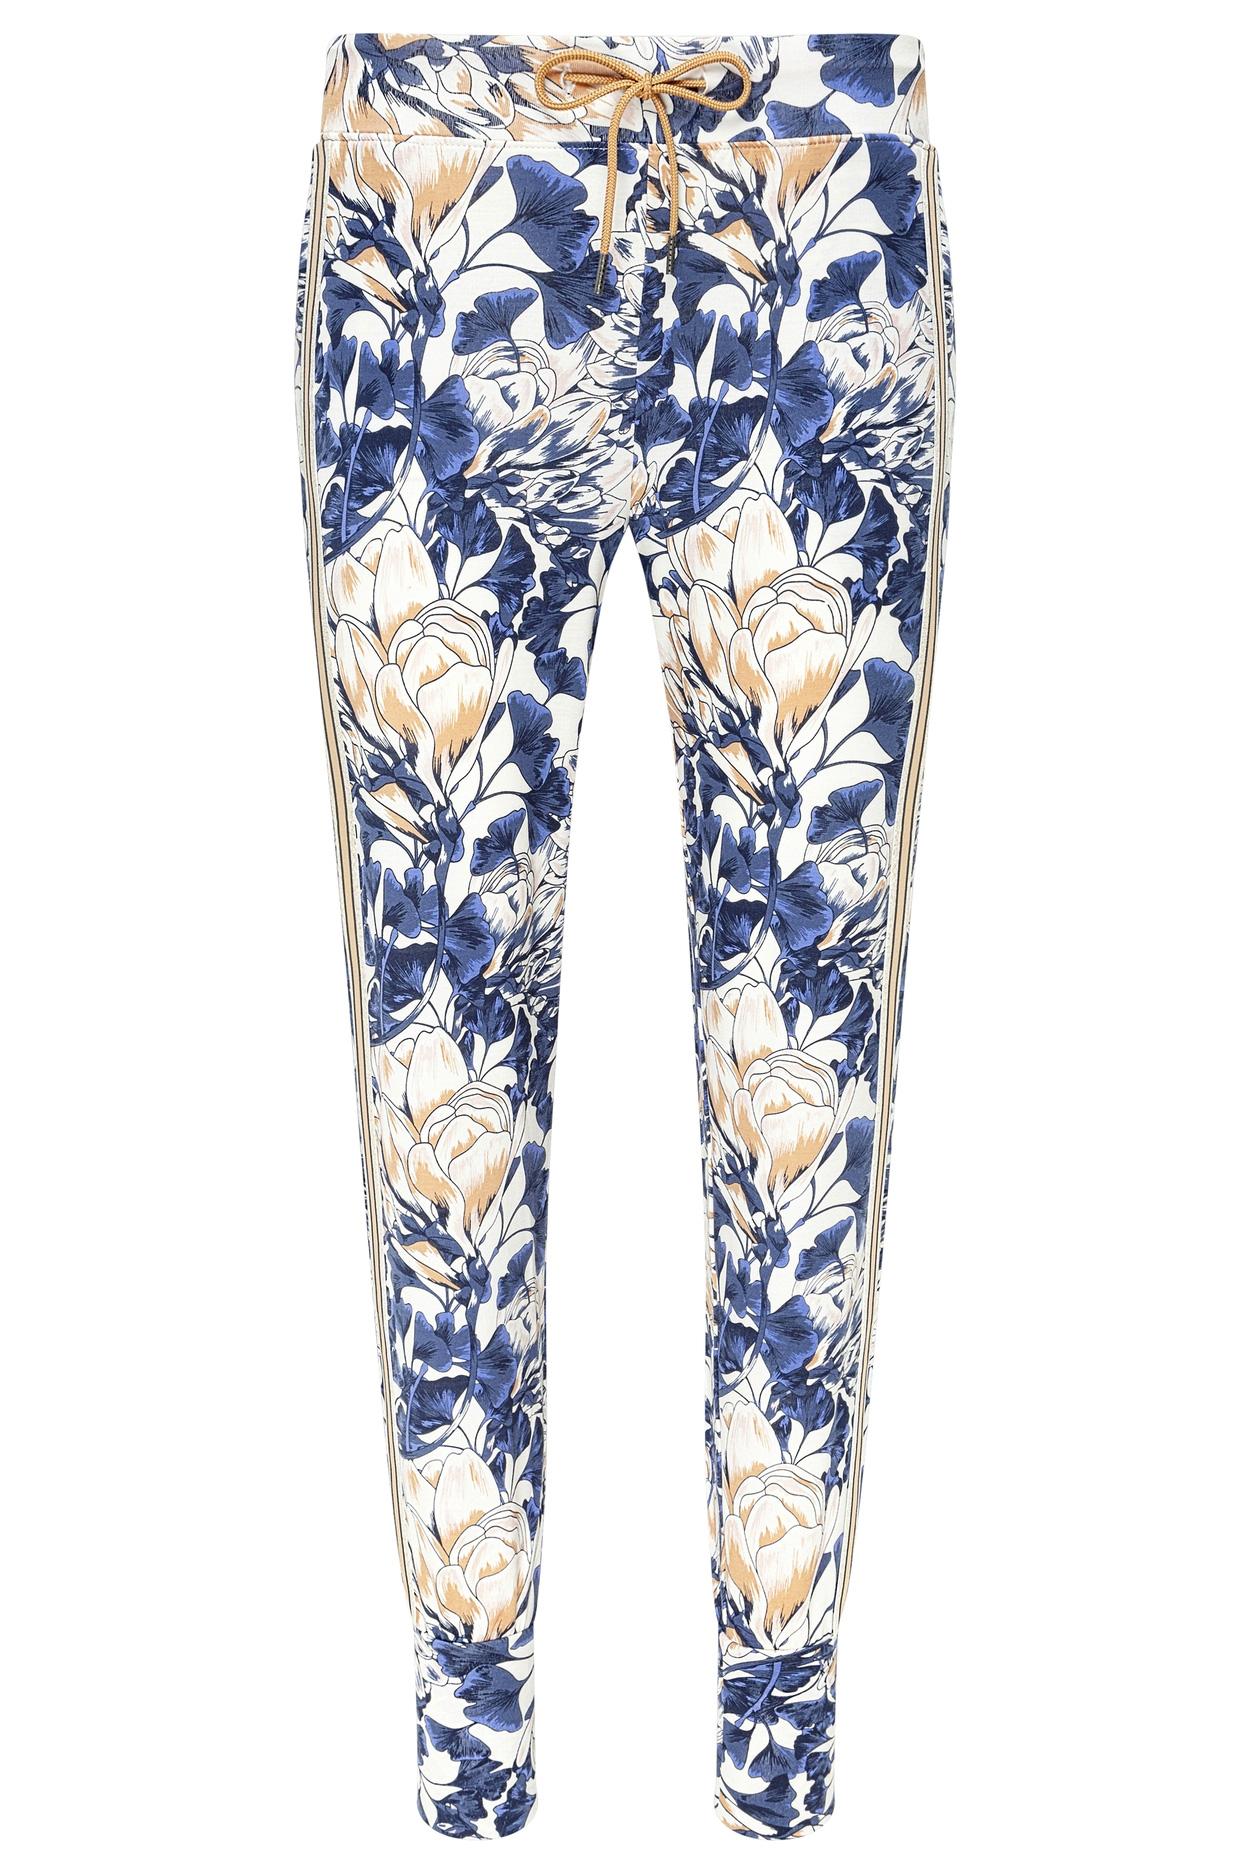 Женские брюки из трикотажа 8529202H Jockey